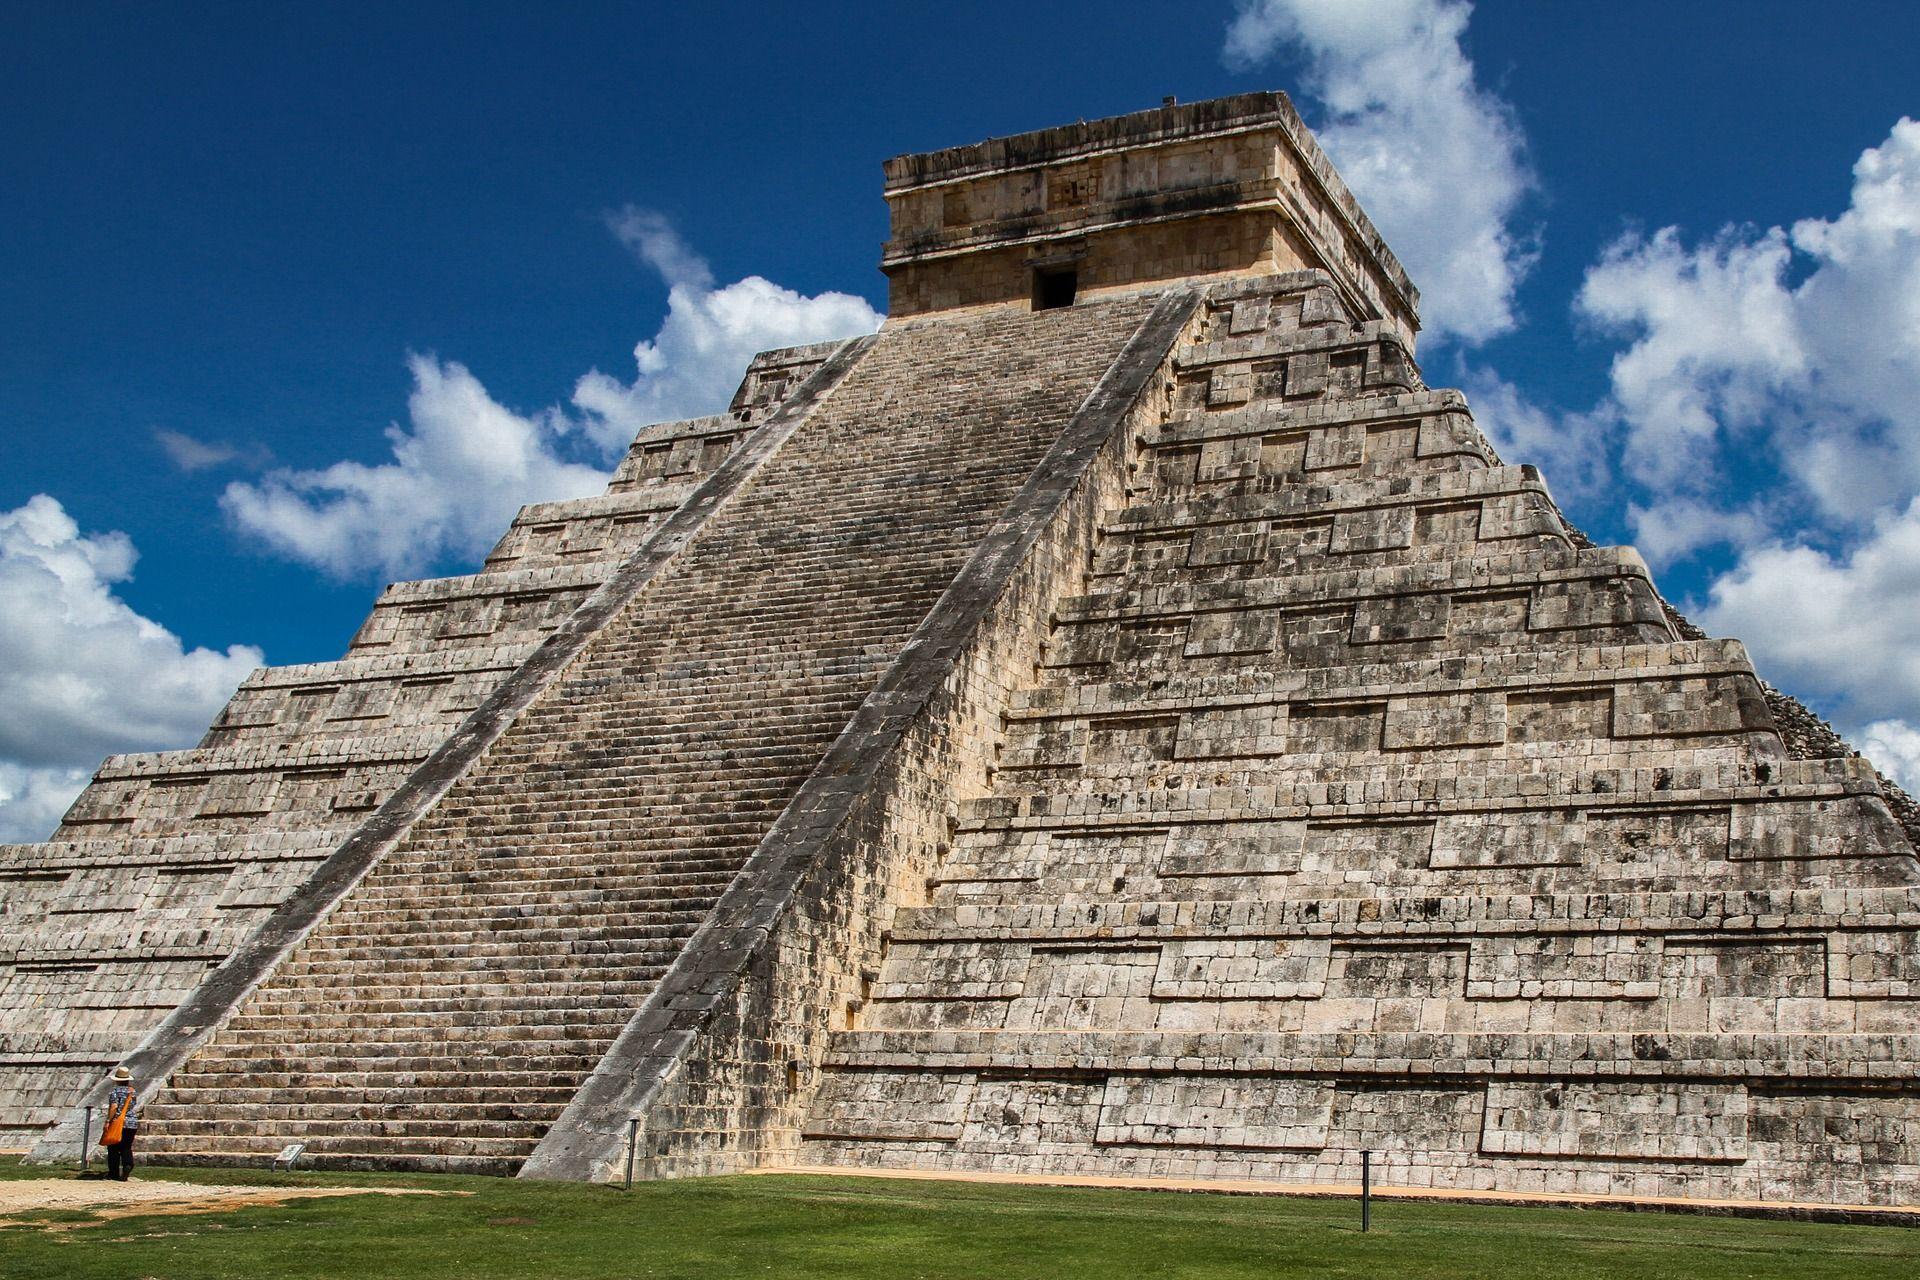 Mexico · Chichen Itza ================================ #ancient #building #city #history #Mayan #ruin #sevenwondersoftheworld #ThePyramidofKukulkan #worldheritagesite #ChichenItza #Mexico #sceneries #amazingplace #beautifulplace #amazingplaces #beautifulplaces #scenery #world #travel #nature #landscape #traveling #travelling #travelphotography #naturephotography #photography #follow